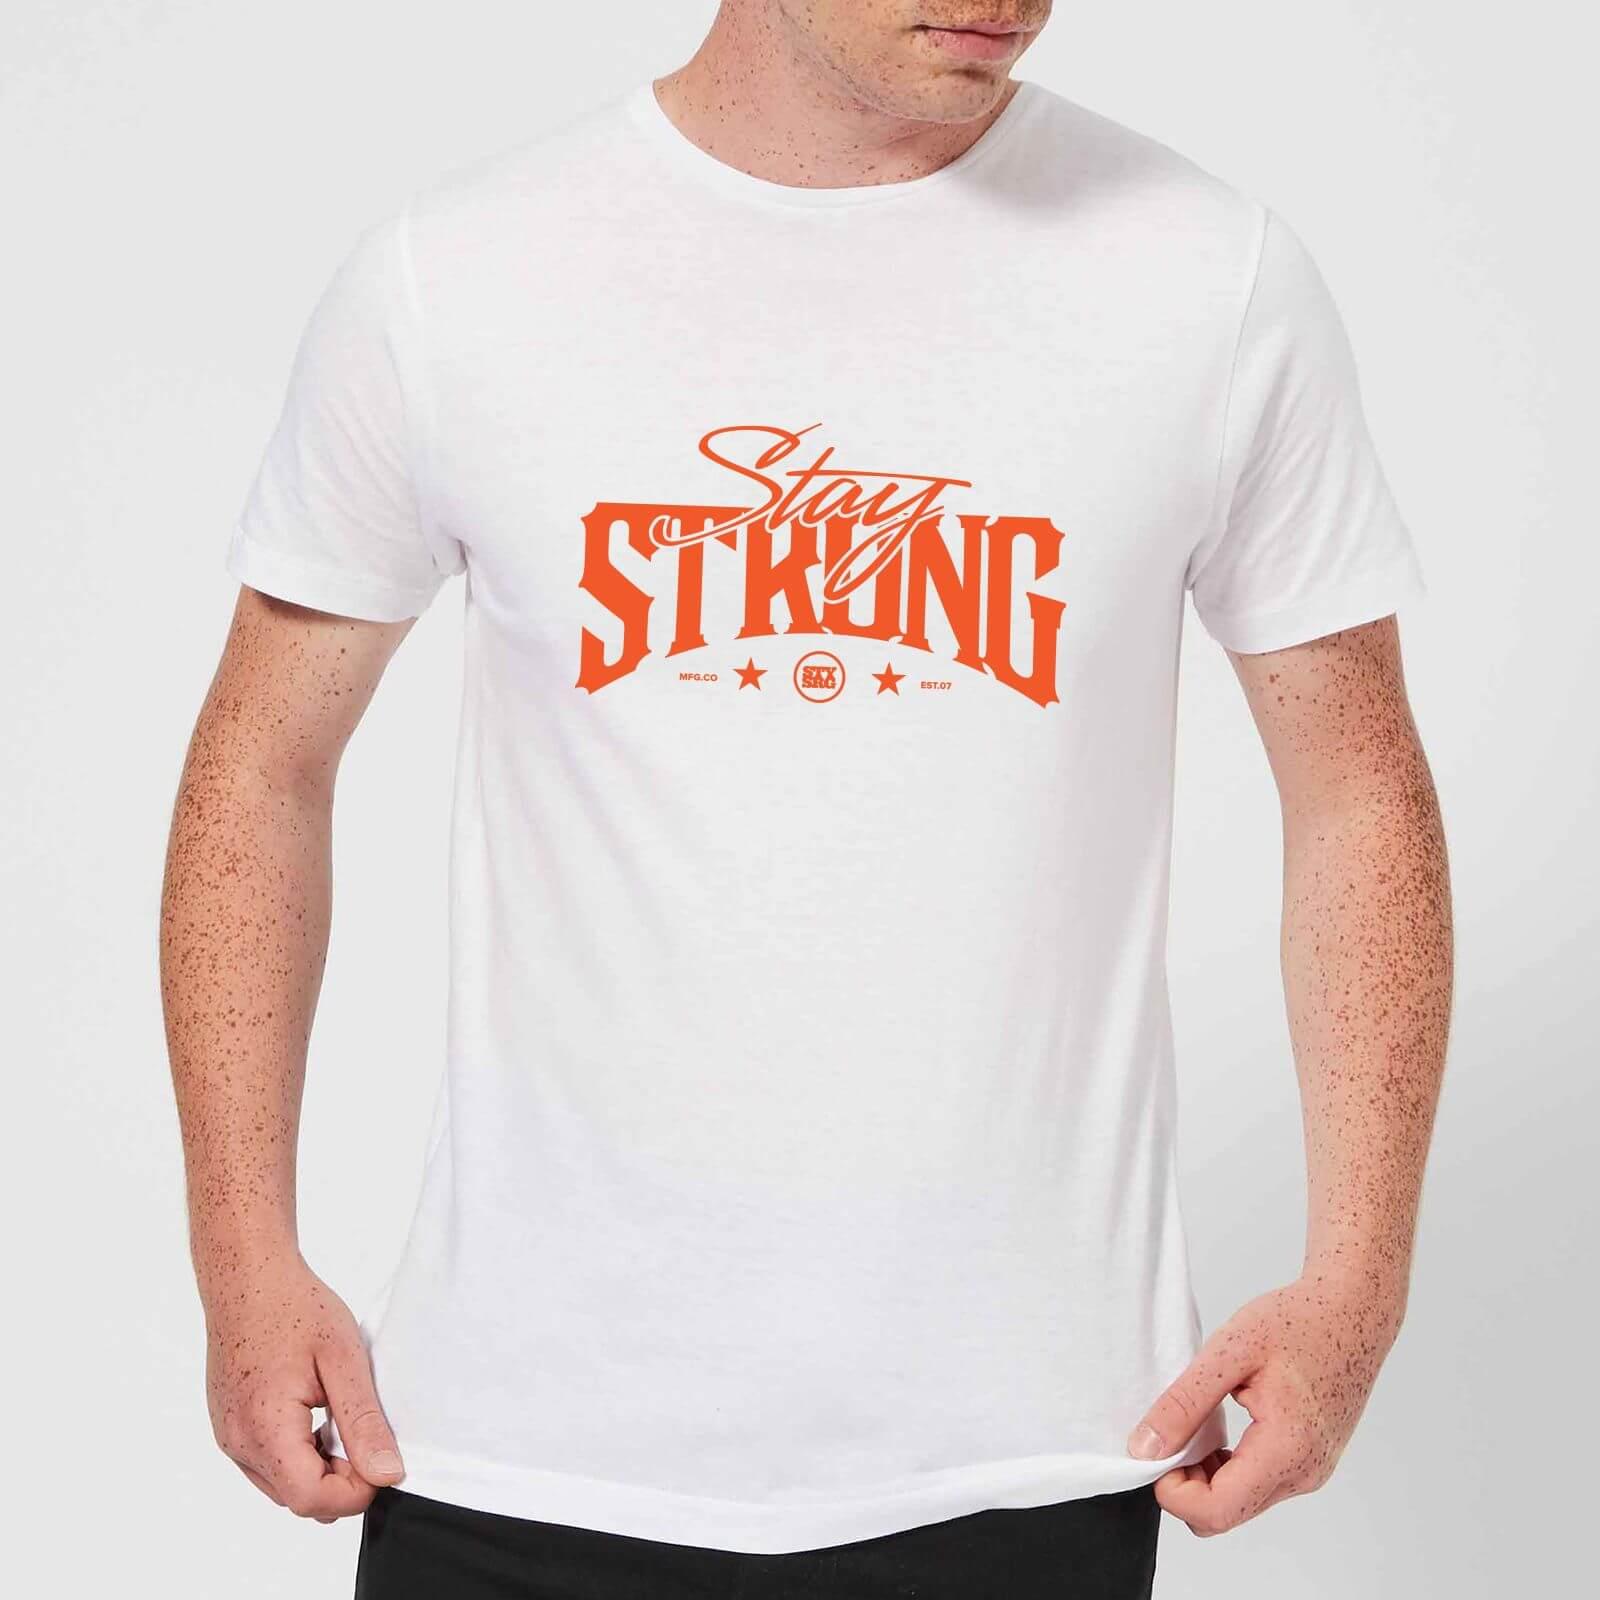 Stay Strong Logo Men's T-Shirt - White - L - Weiß